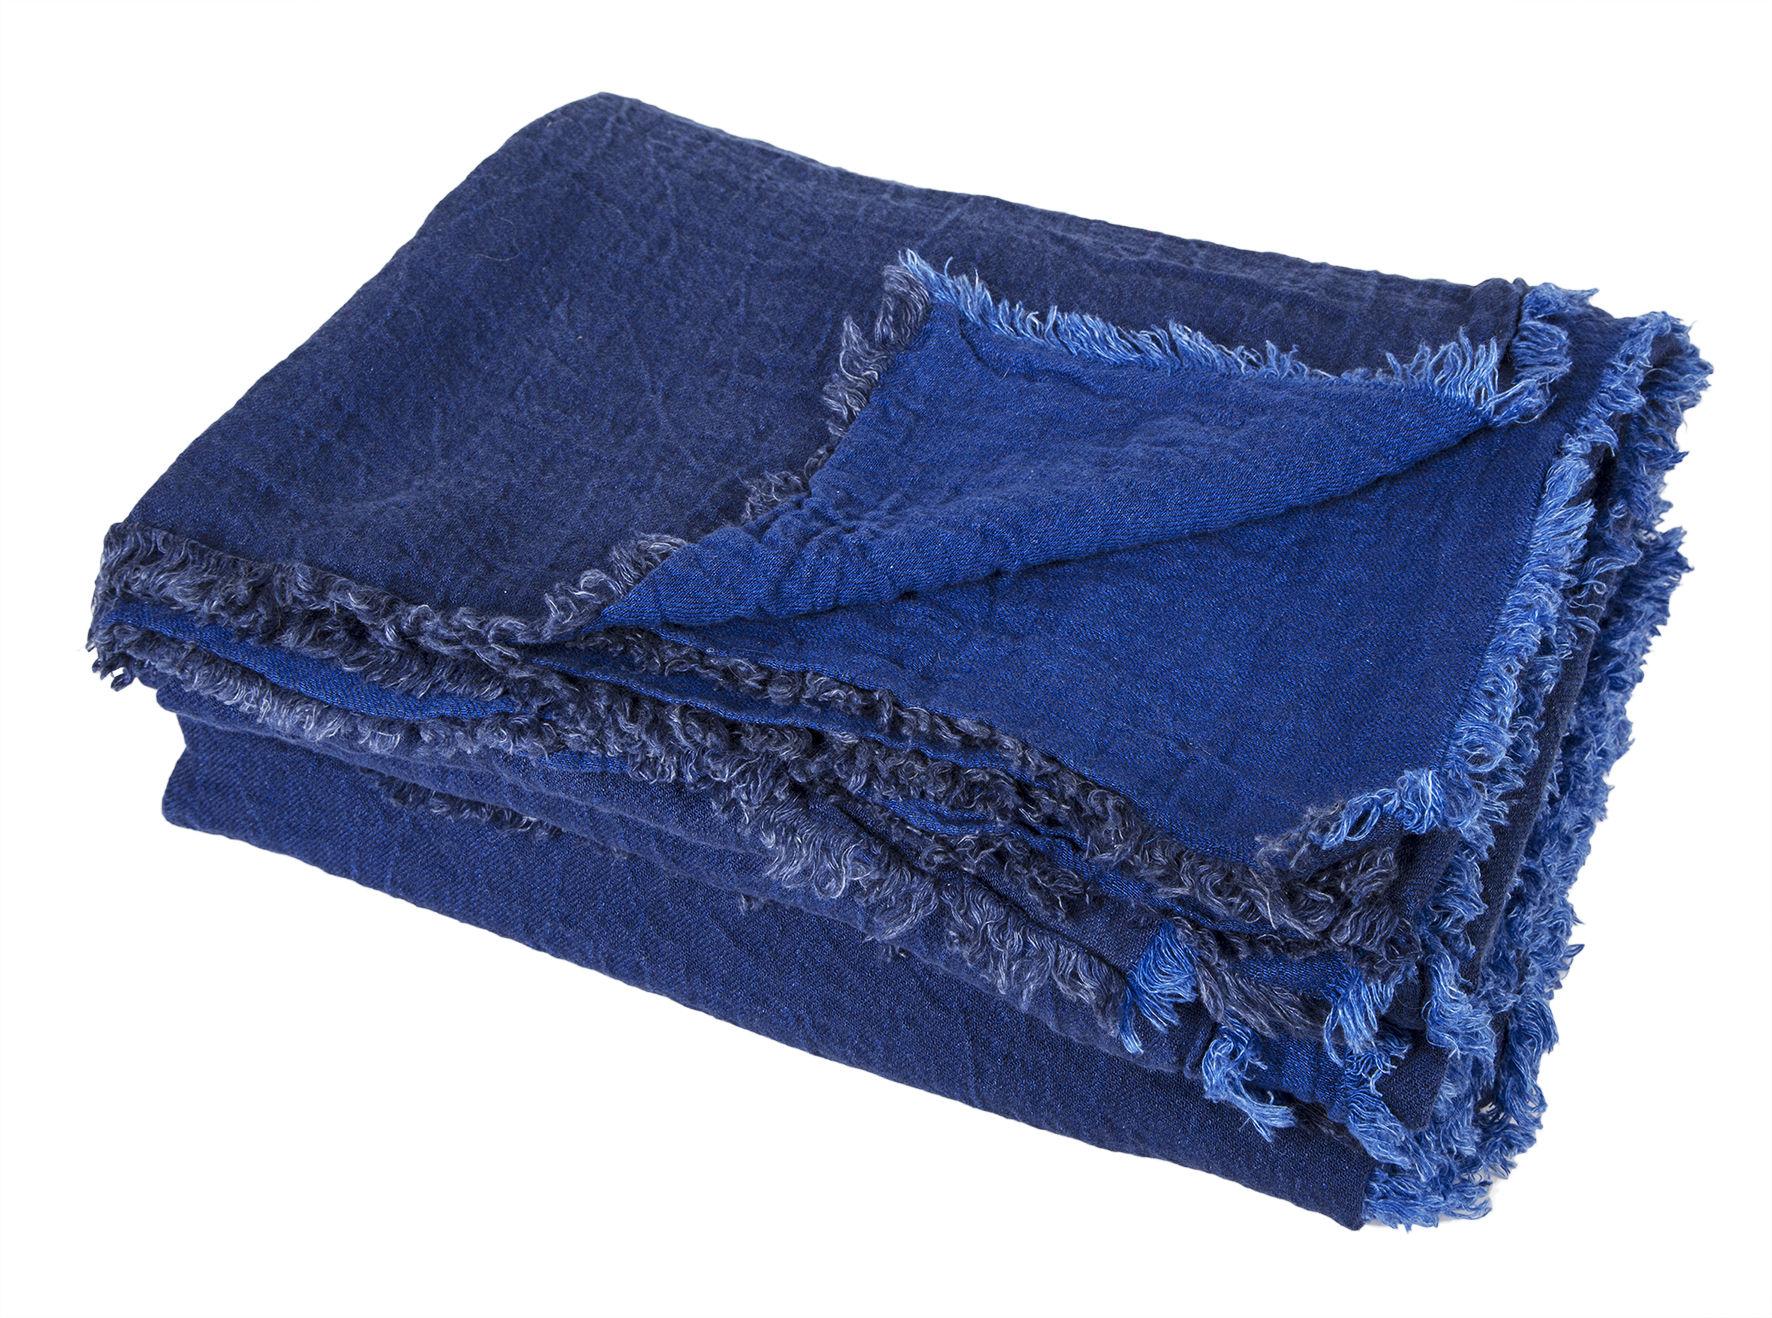 Valentine's day - Valentines Day: Our best ideas for Her - Vice Versa Plaid - 140 x 250 cm by Maison de Vacances - Cobalt blue - Flax